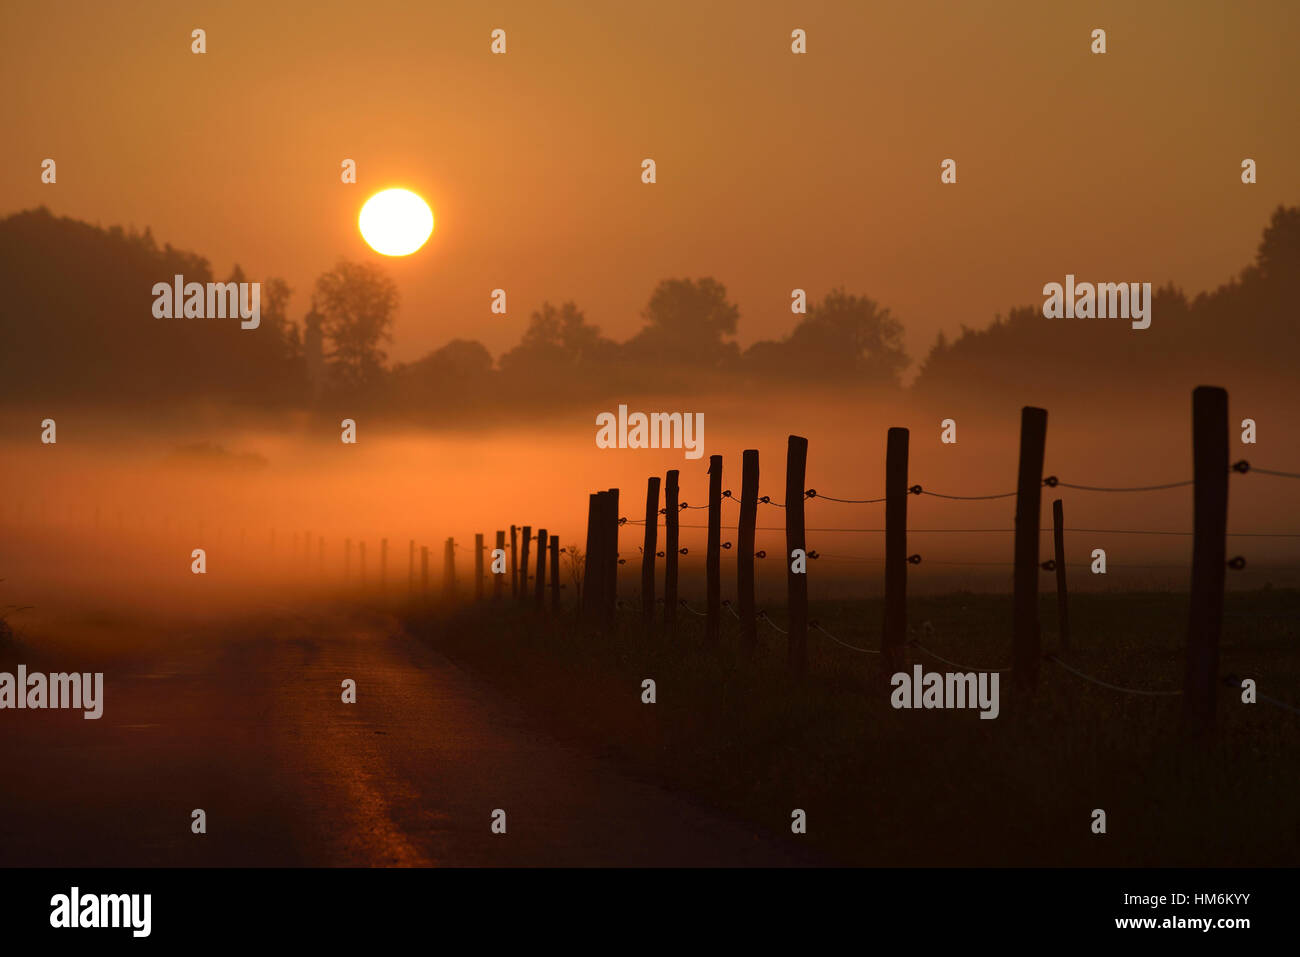 Rising Sun shines on foggy landscape - Stock Image